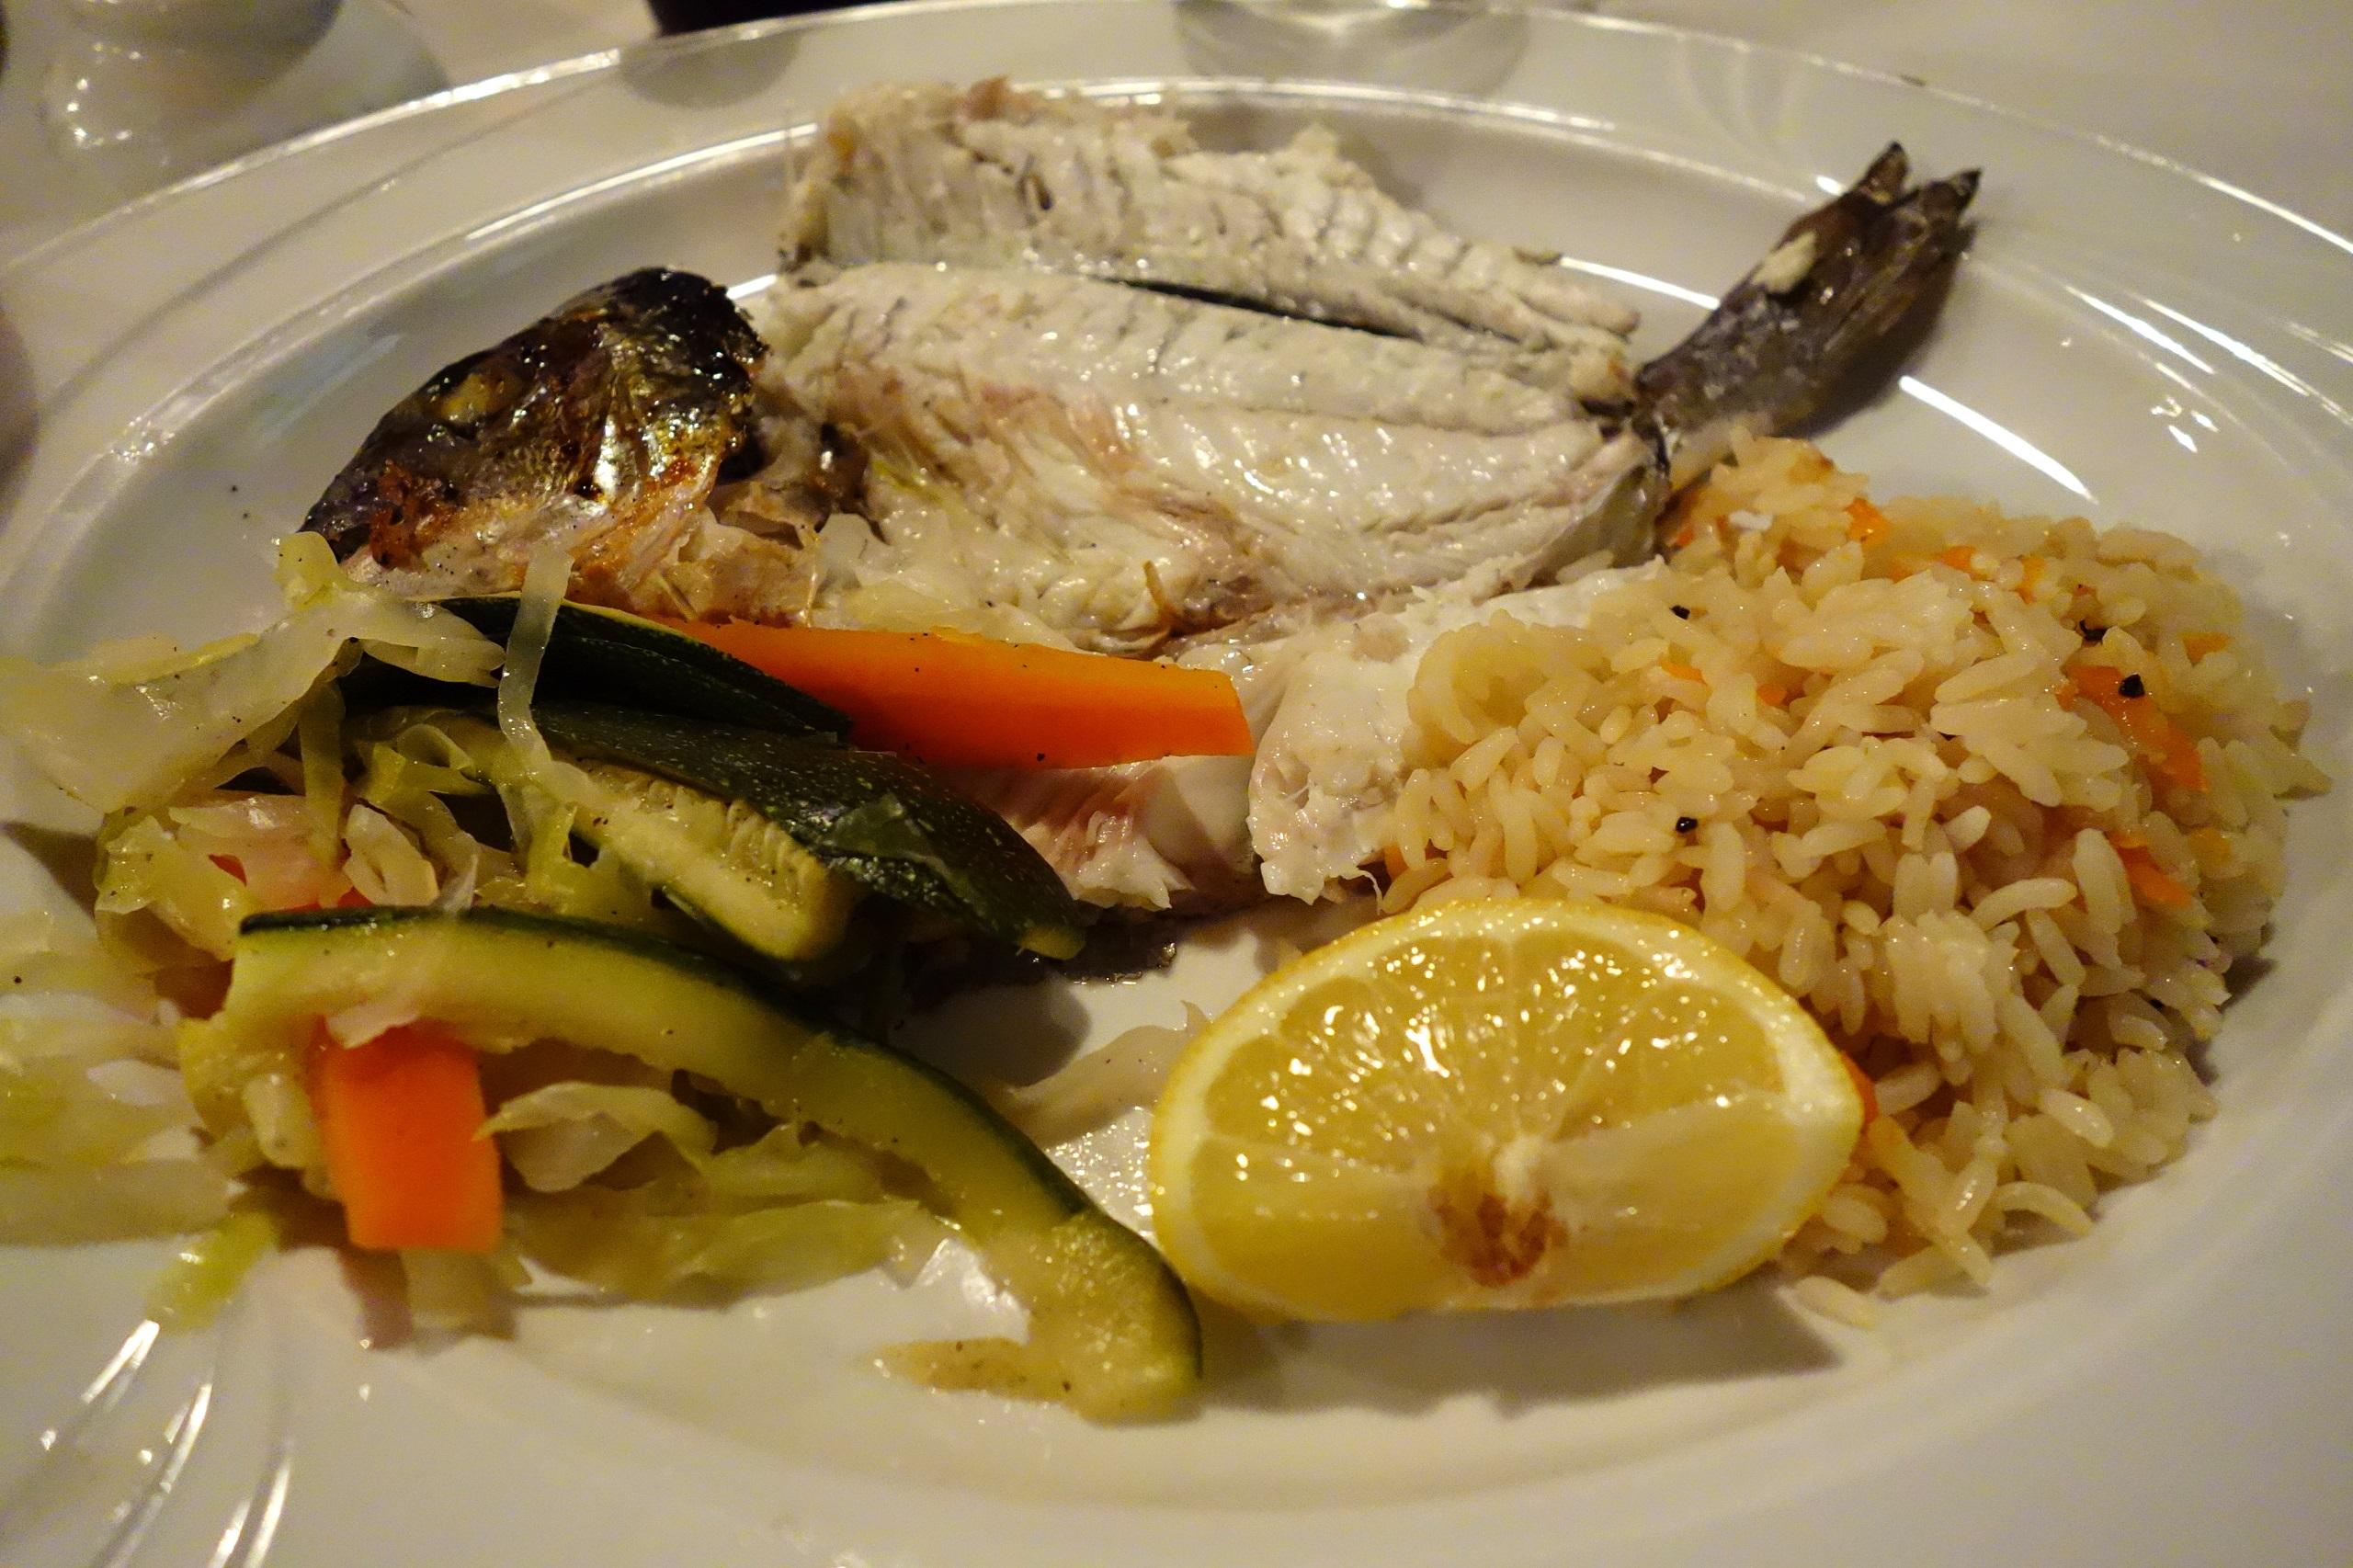 Kuchnia cypryjska - okoń morski z ryżem i warzywami